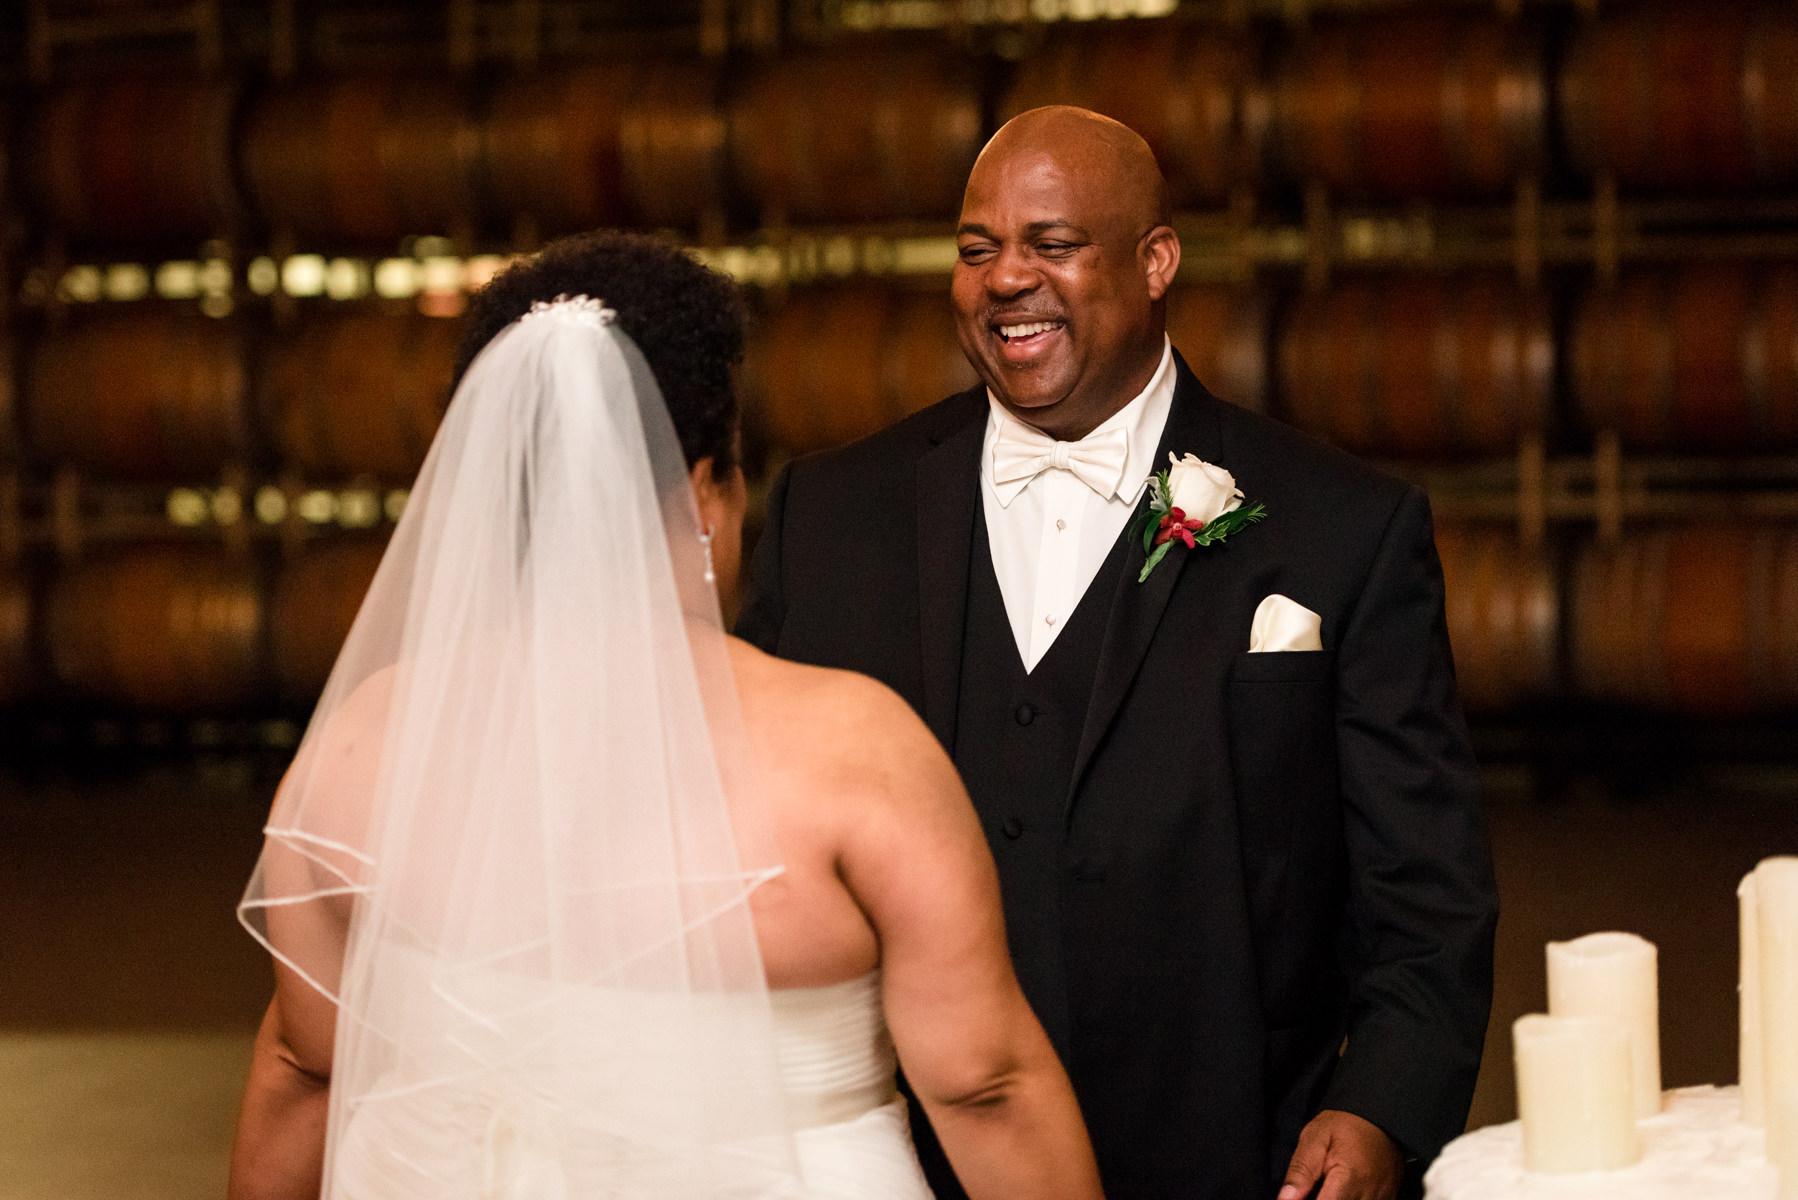 Andrew Tat - Documentary Wedding Photography - Columbia Winery - Woodinville, Washington -Patricia & Teffin - 03.jpg